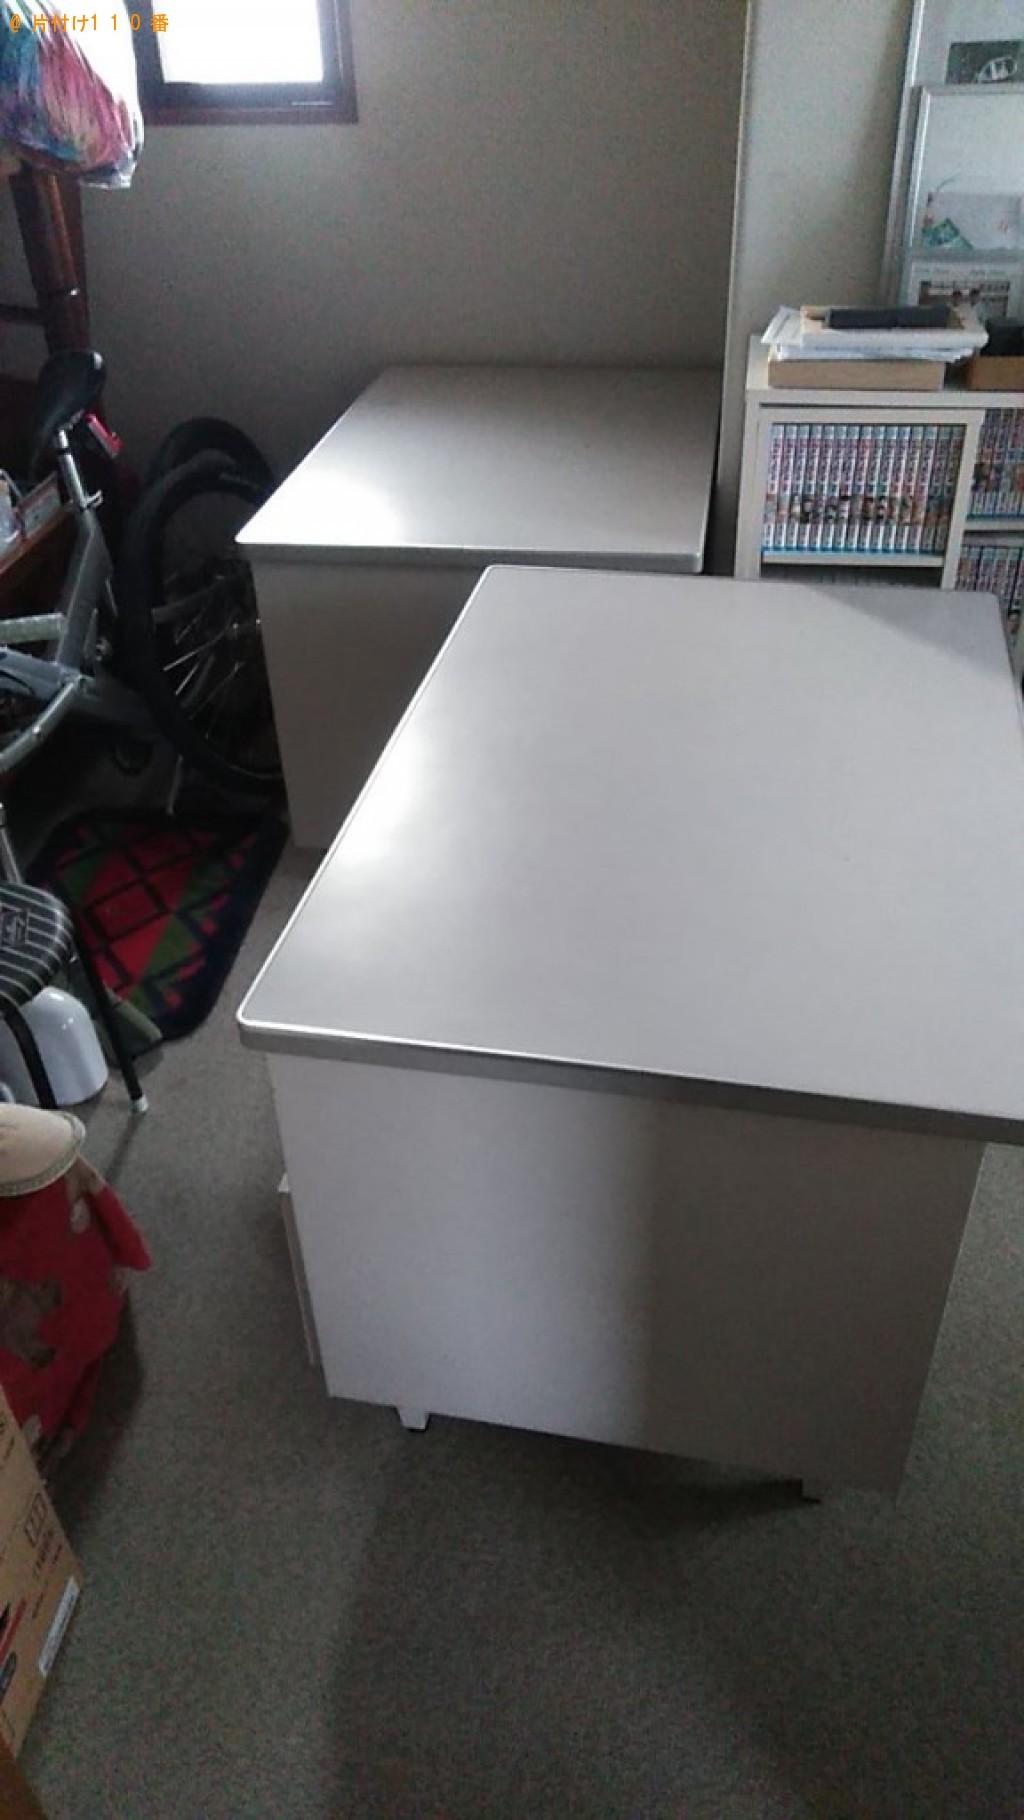 【松山市】学習机の出張不用品回収・処分ご依頼 お客様の声